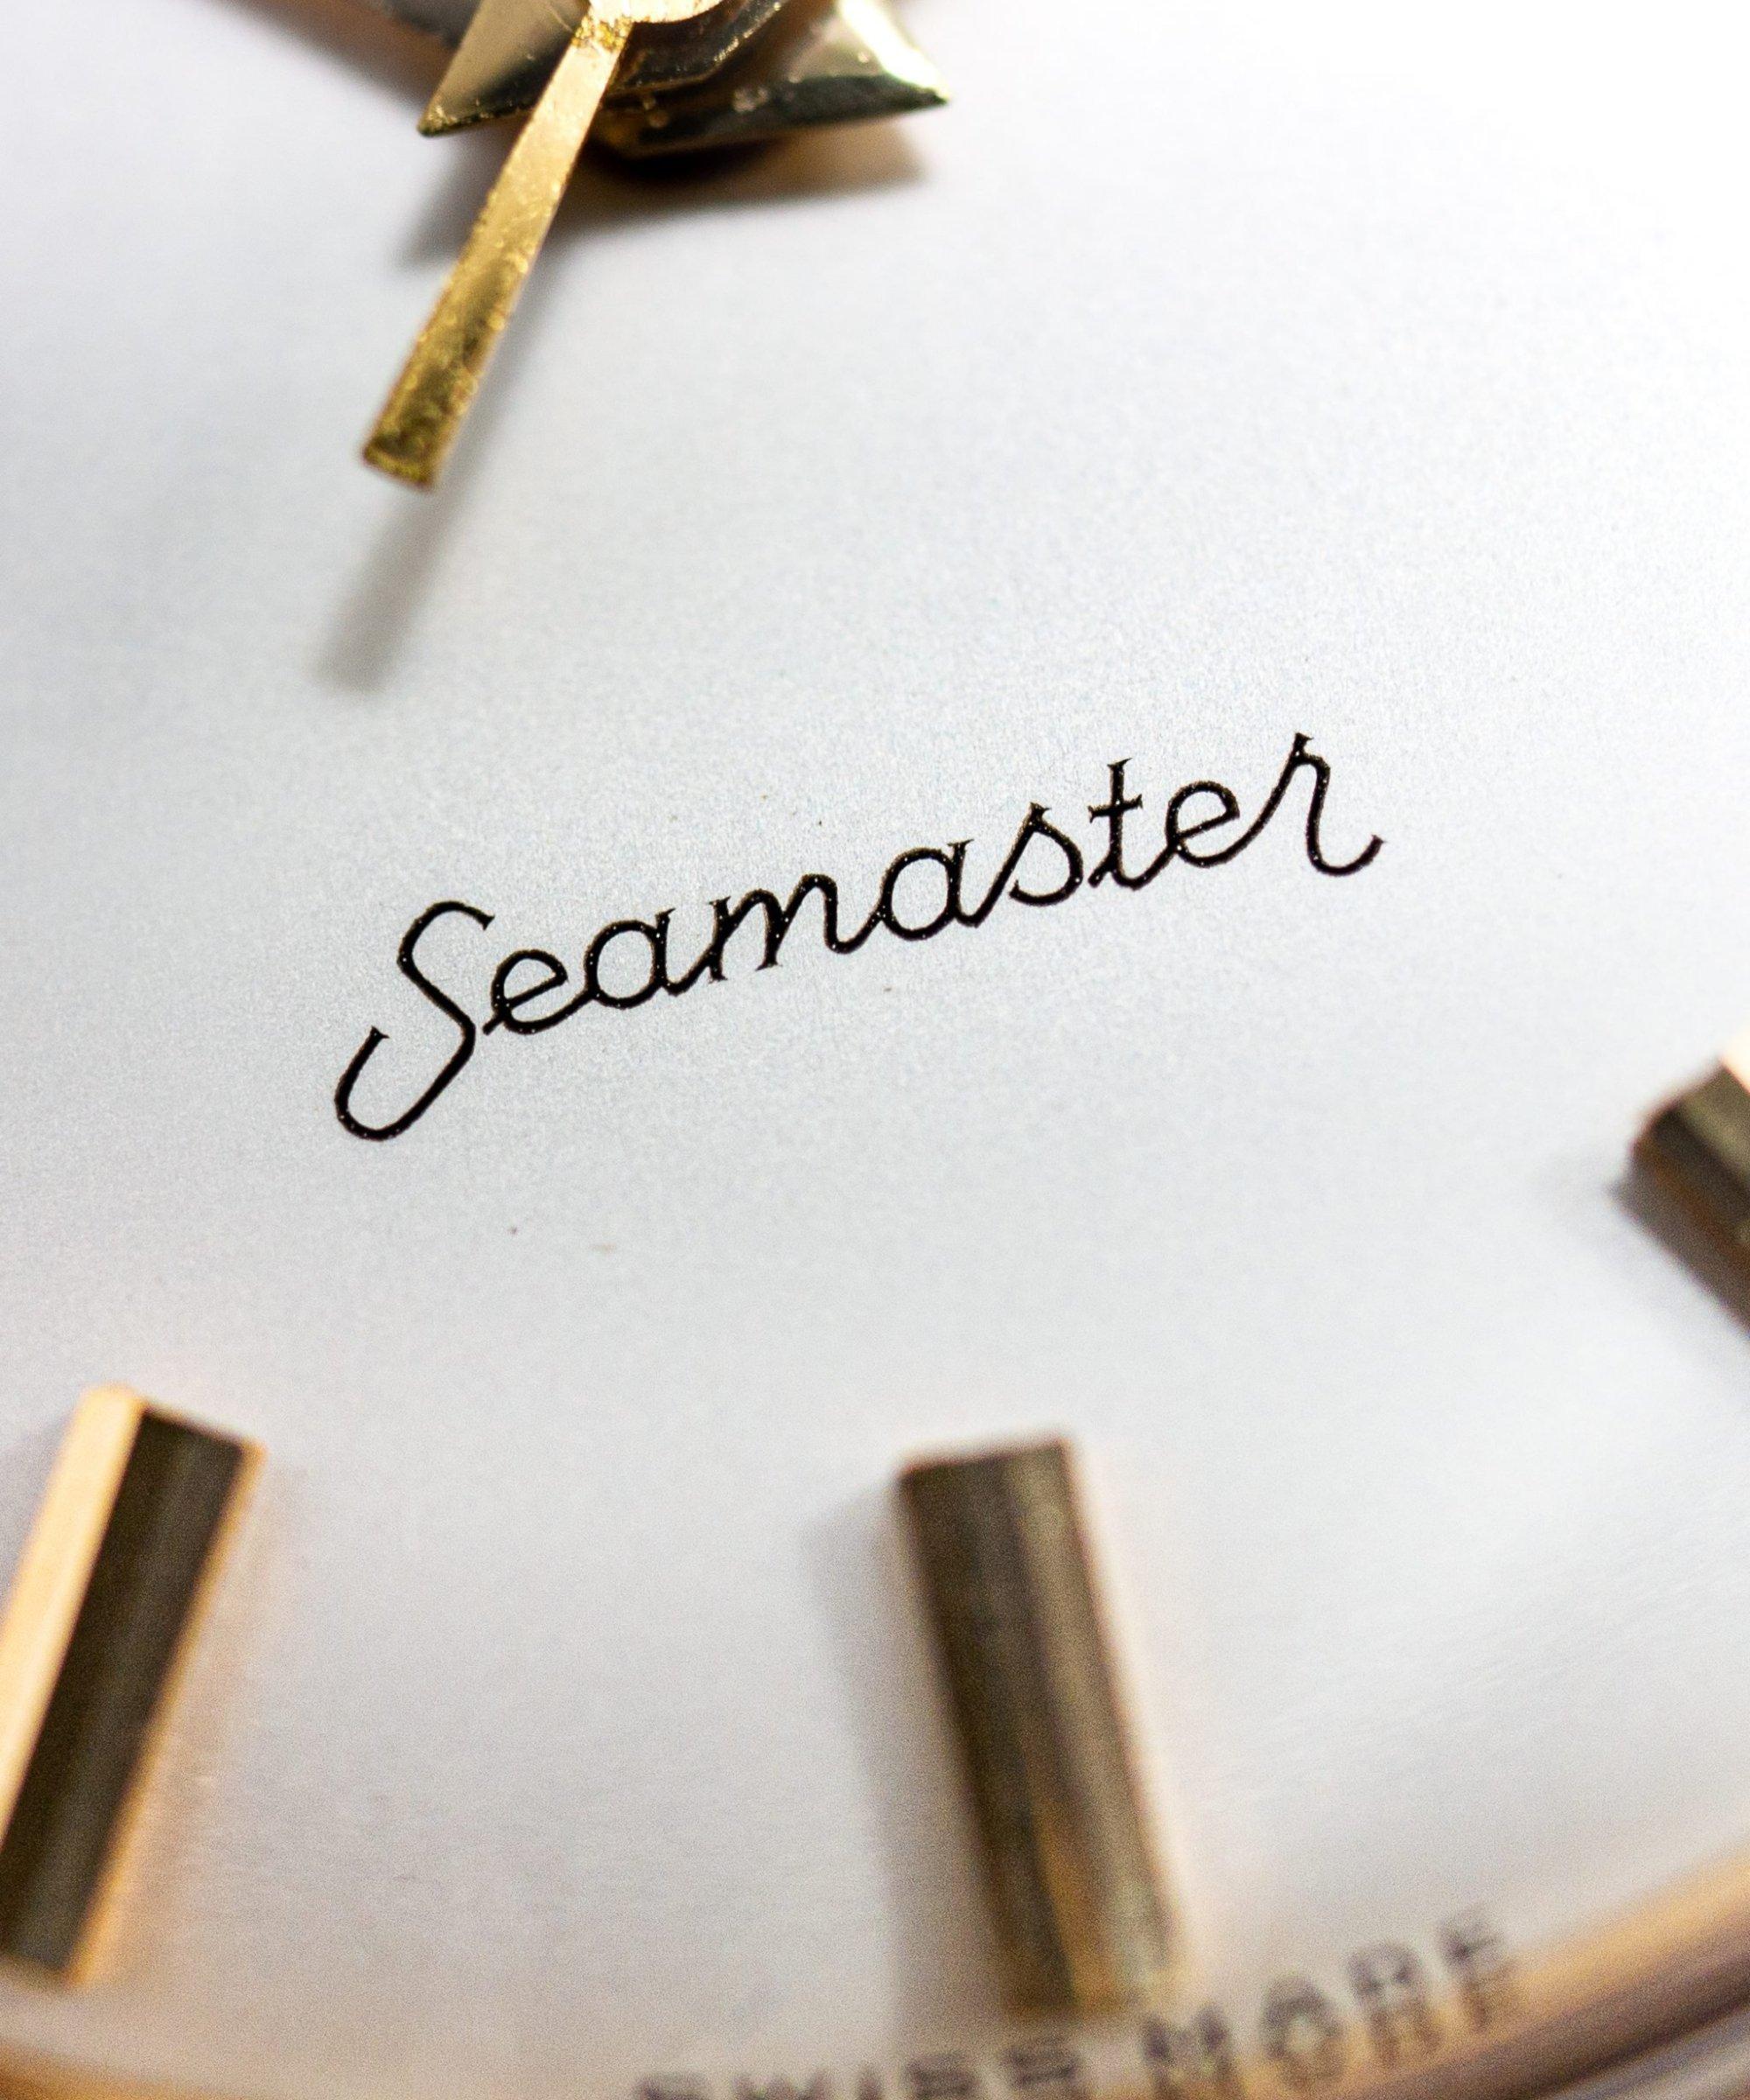 Omega Seamaster Automatic ref. 2846-3 SC